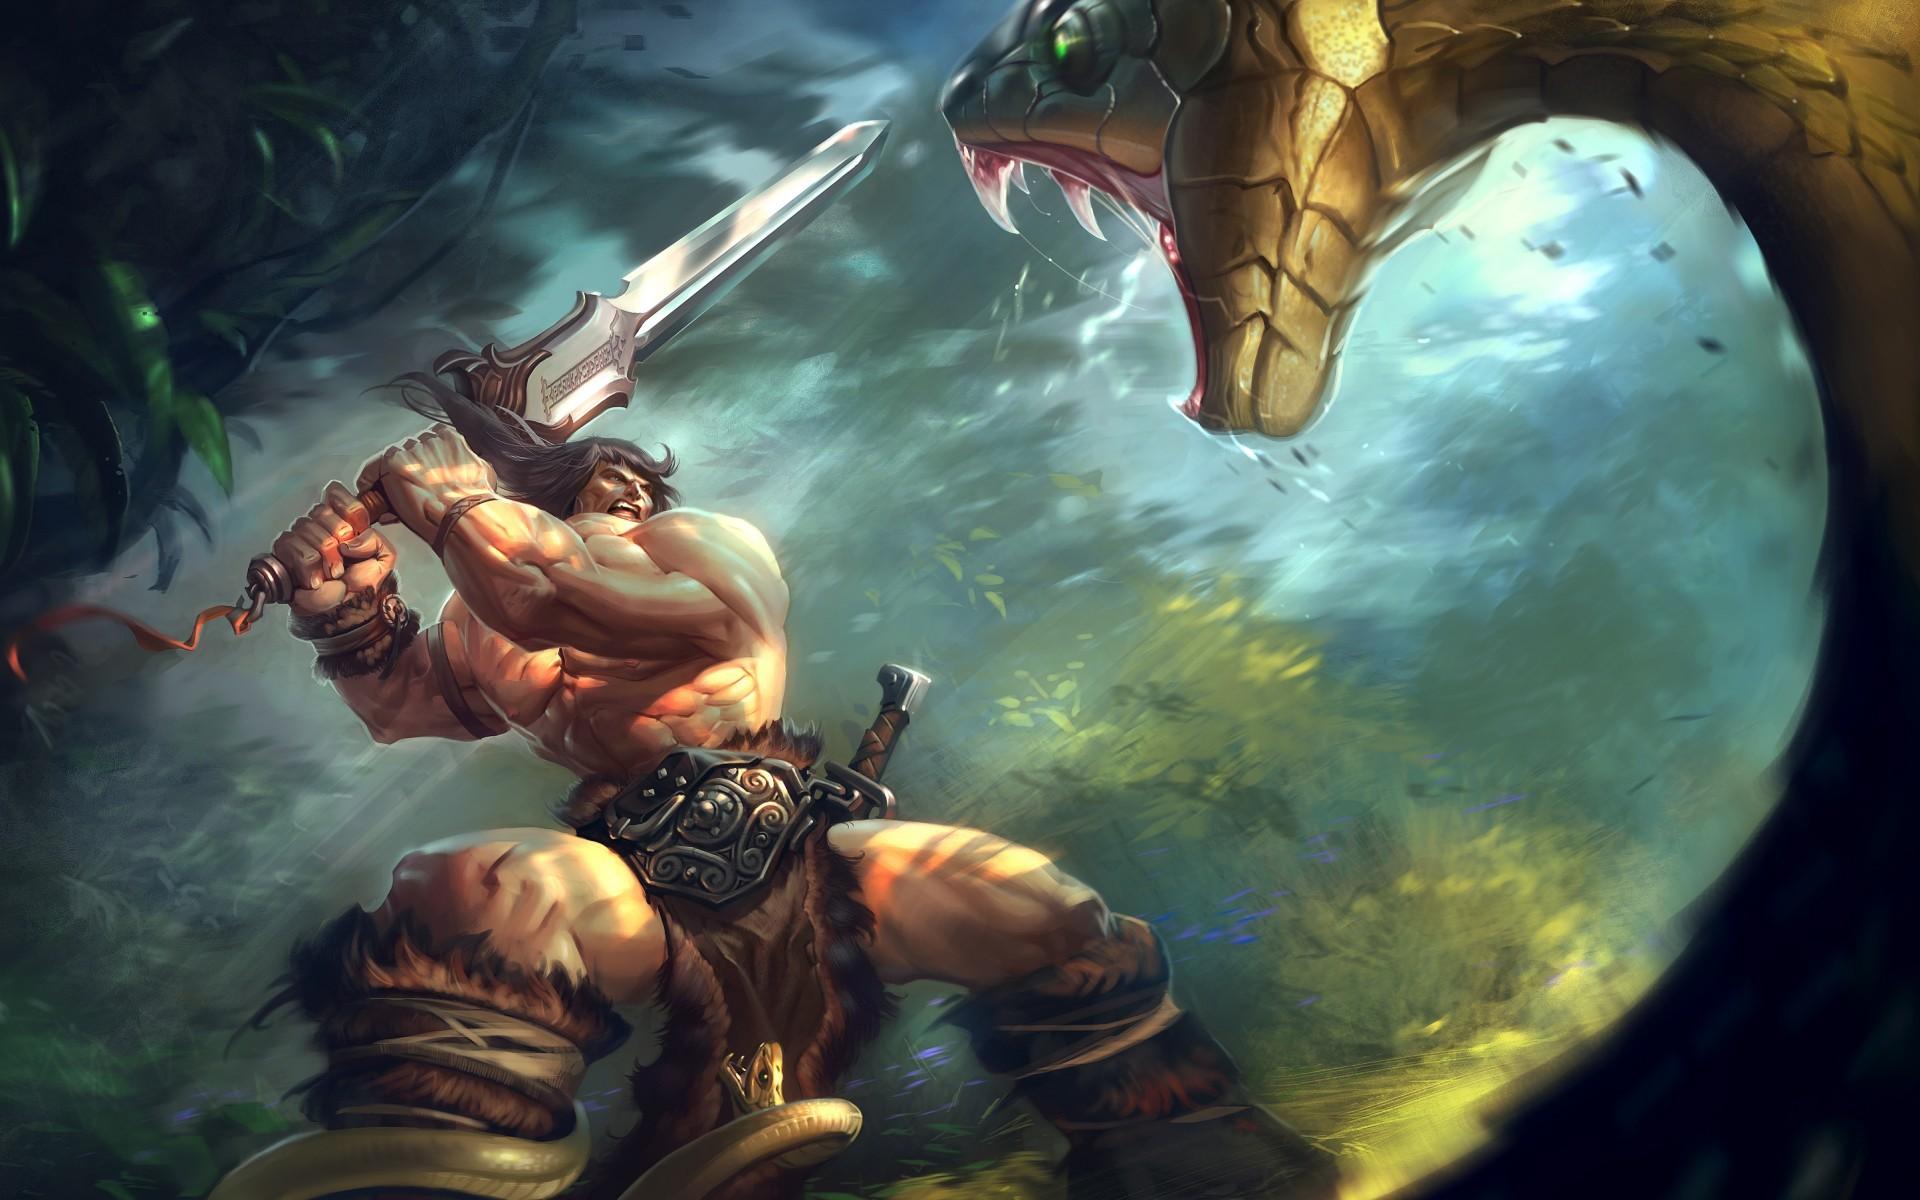 Wallpaper 1920x1200 Px Art Barbarian Conan Fantasy